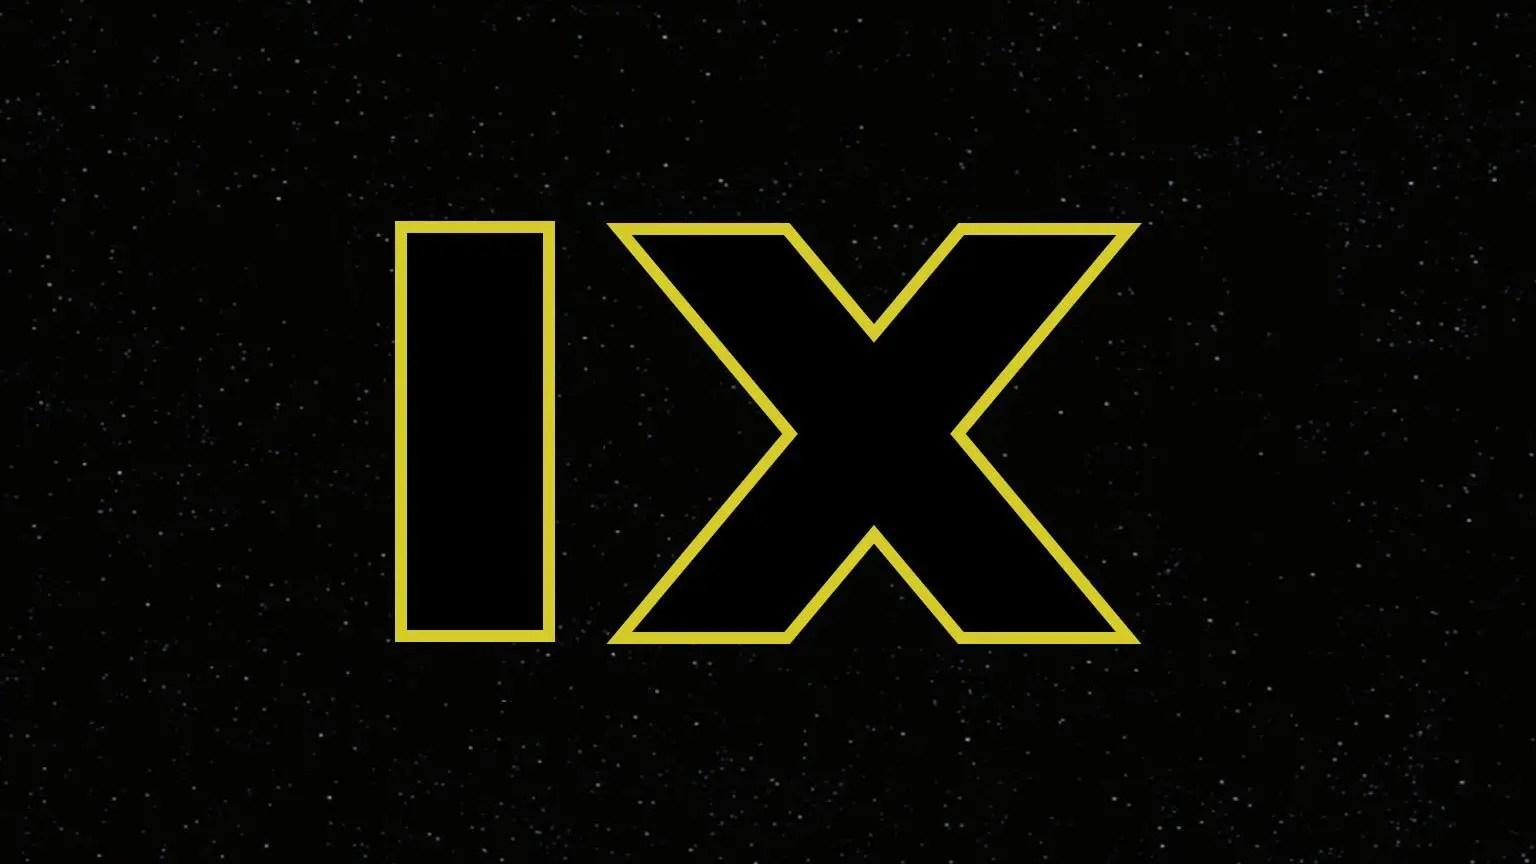 Star Wars Episode IX Logo